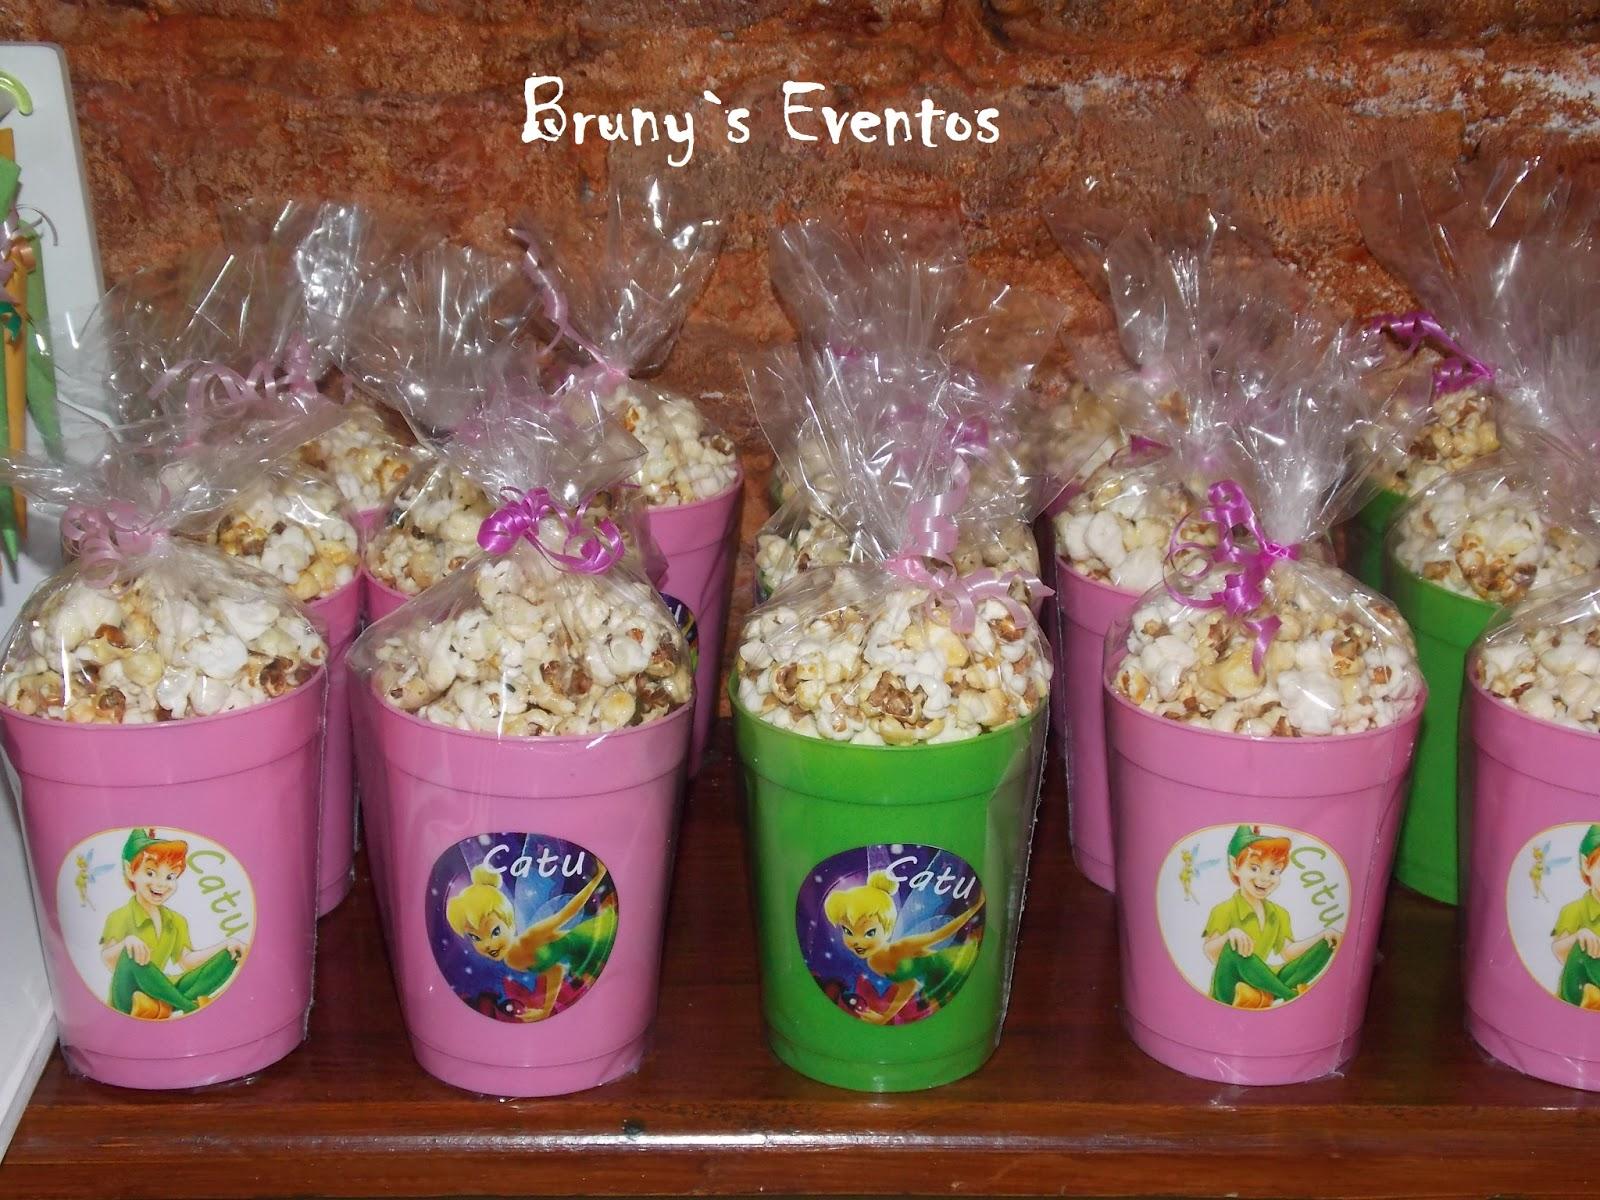 Brunys eventos cumplea os tematico campanita - Vasos para cumpleanos infantiles ...